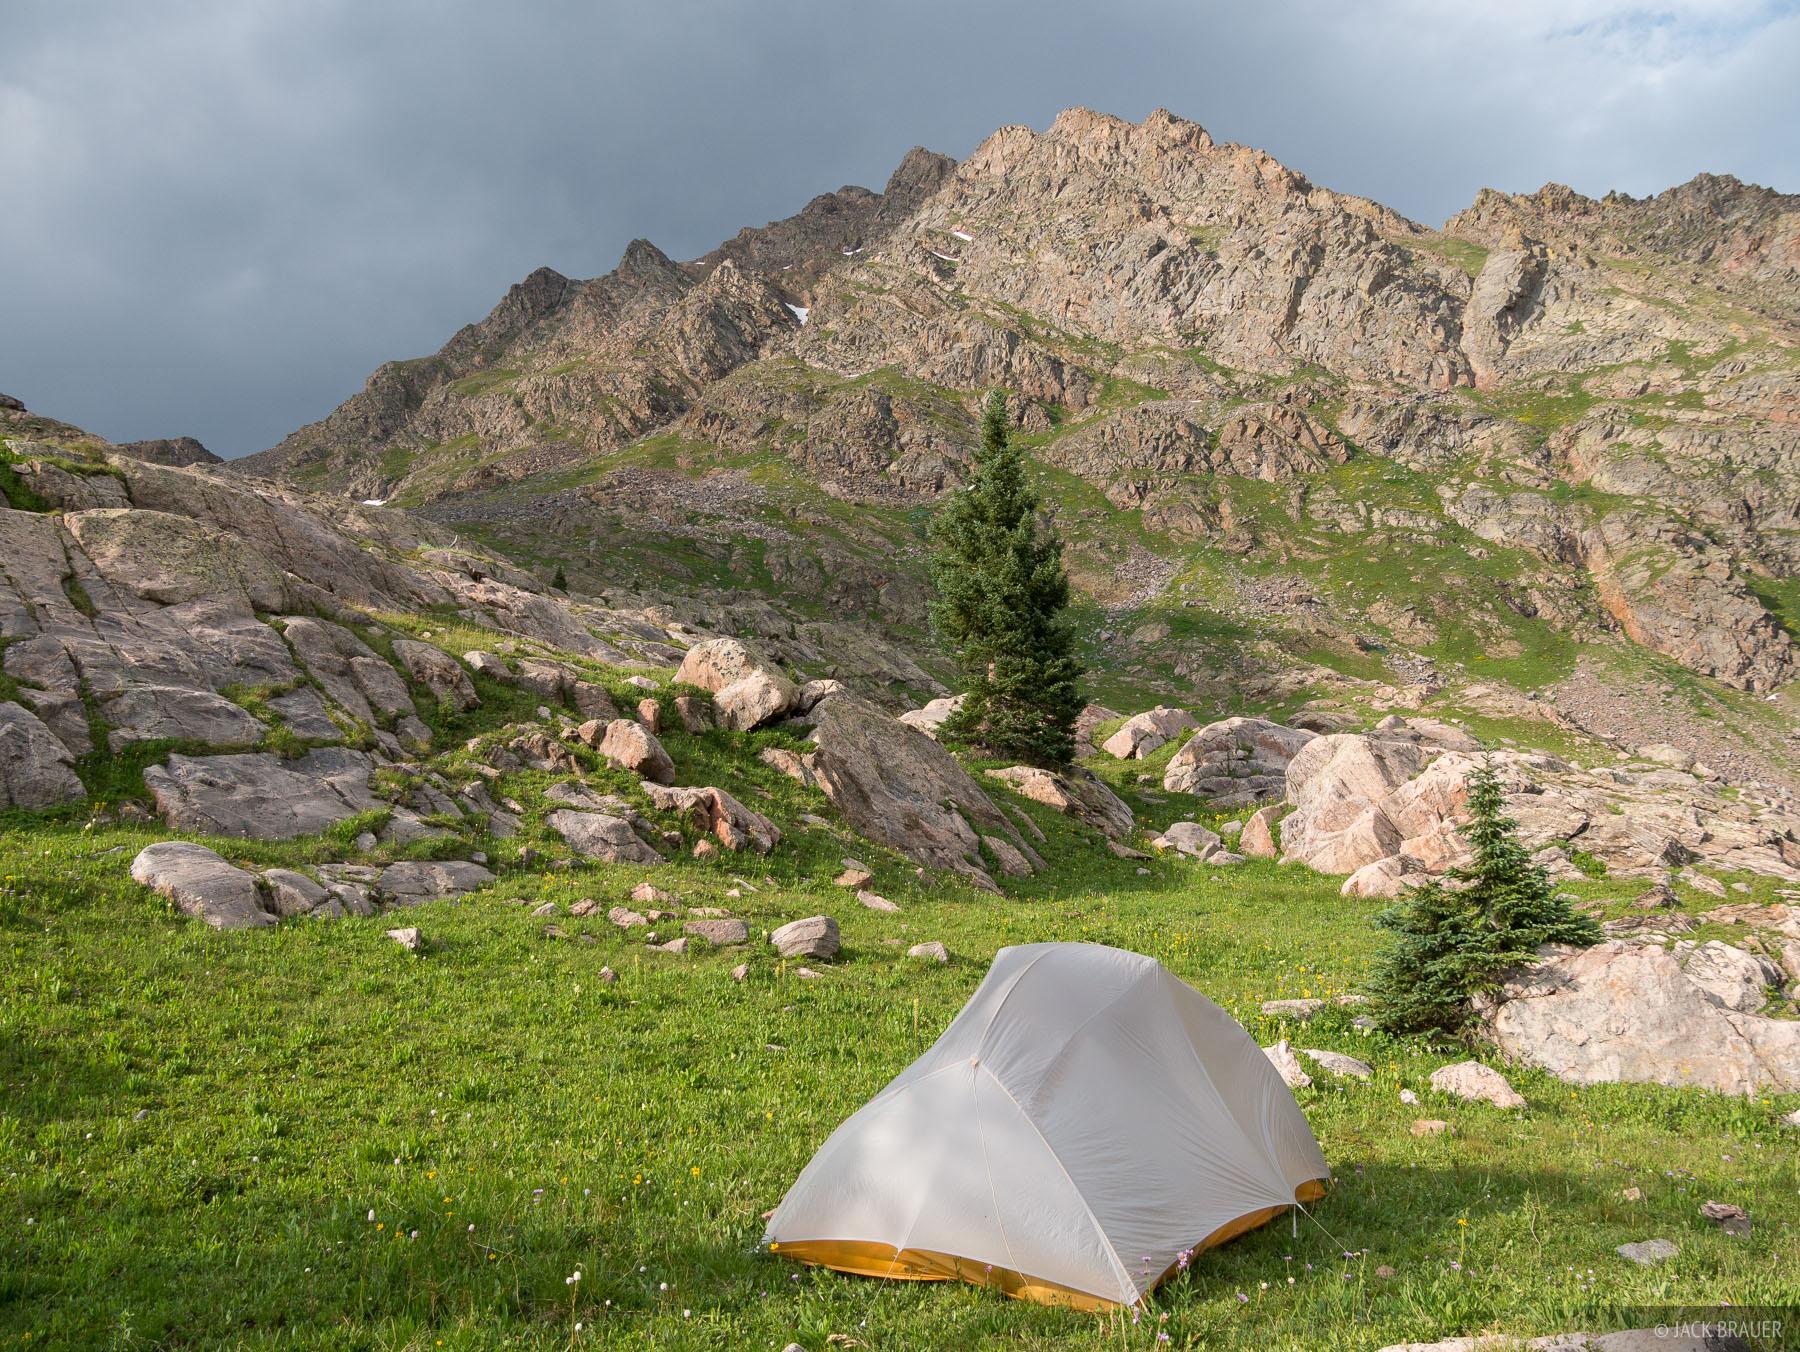 Colorado, Gore Range, tent, Eagles Nest Wilderness, photo